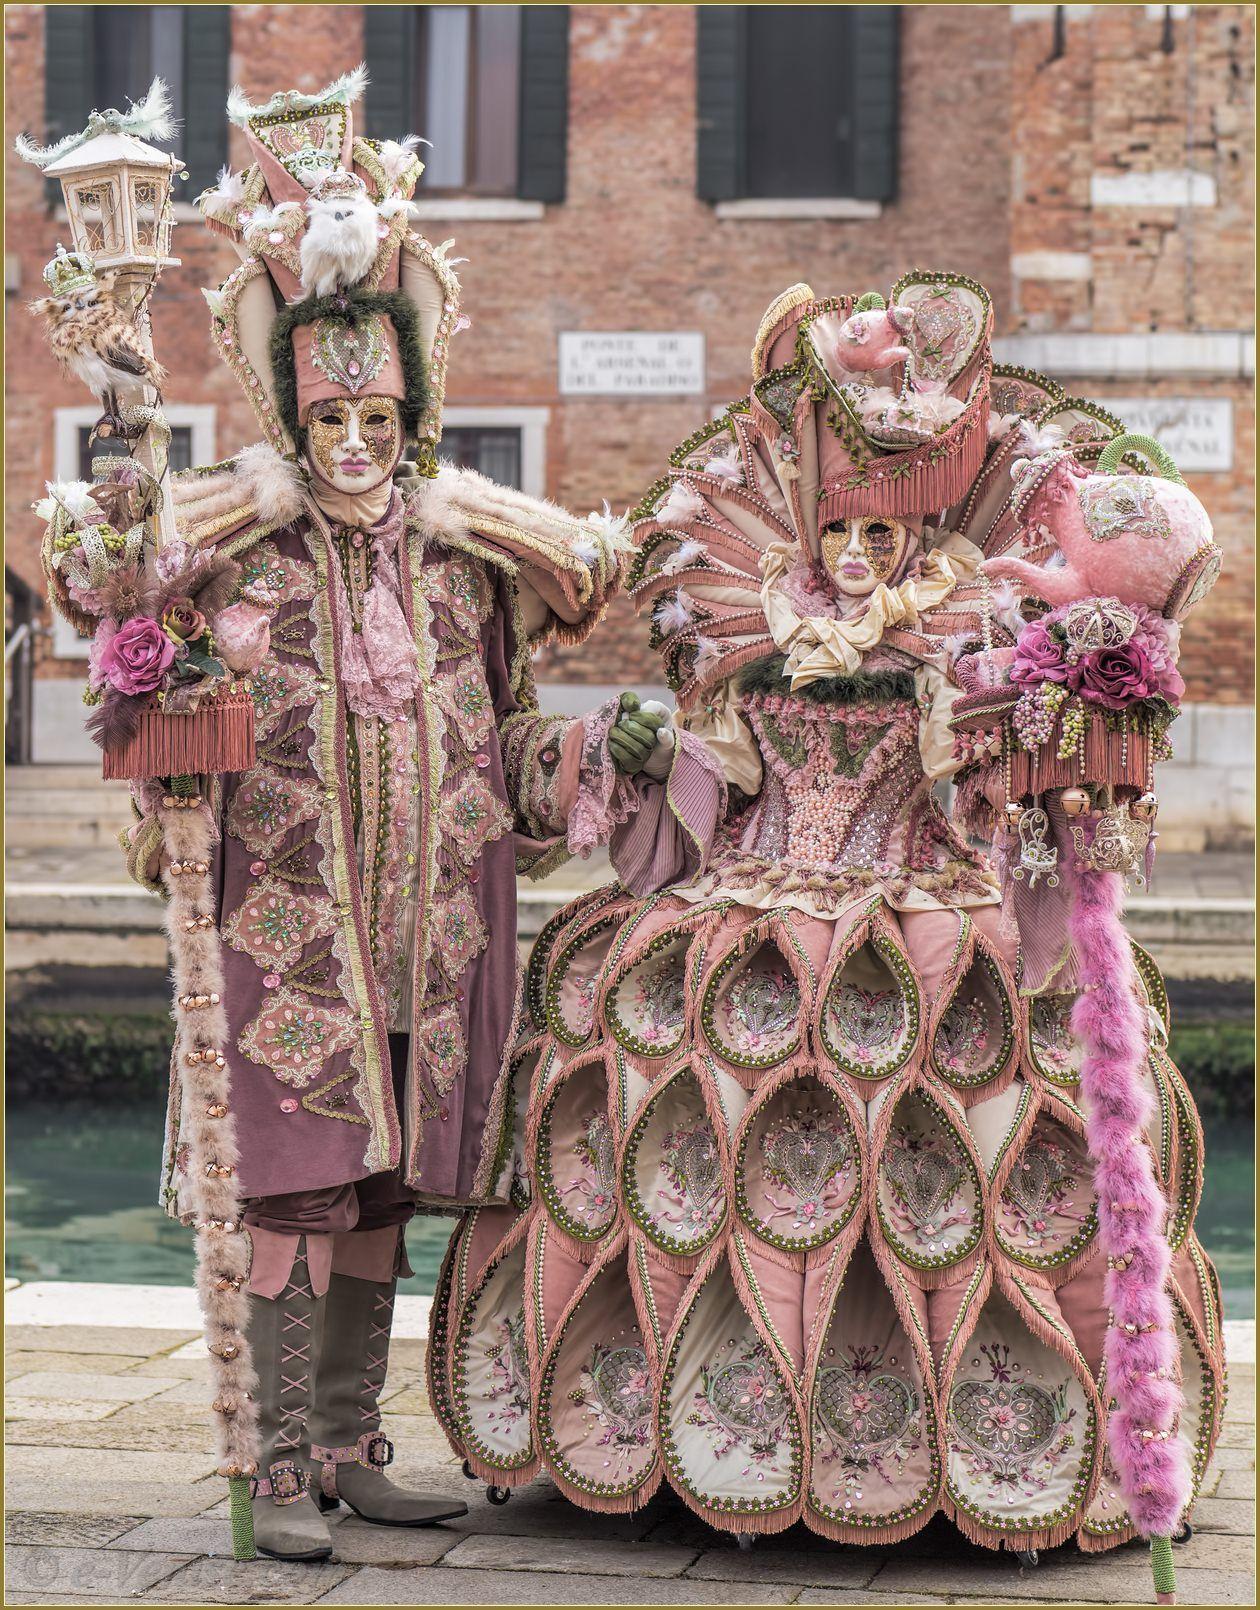 Best 25+ Venice carnival costumes ideas on Pinterest ...